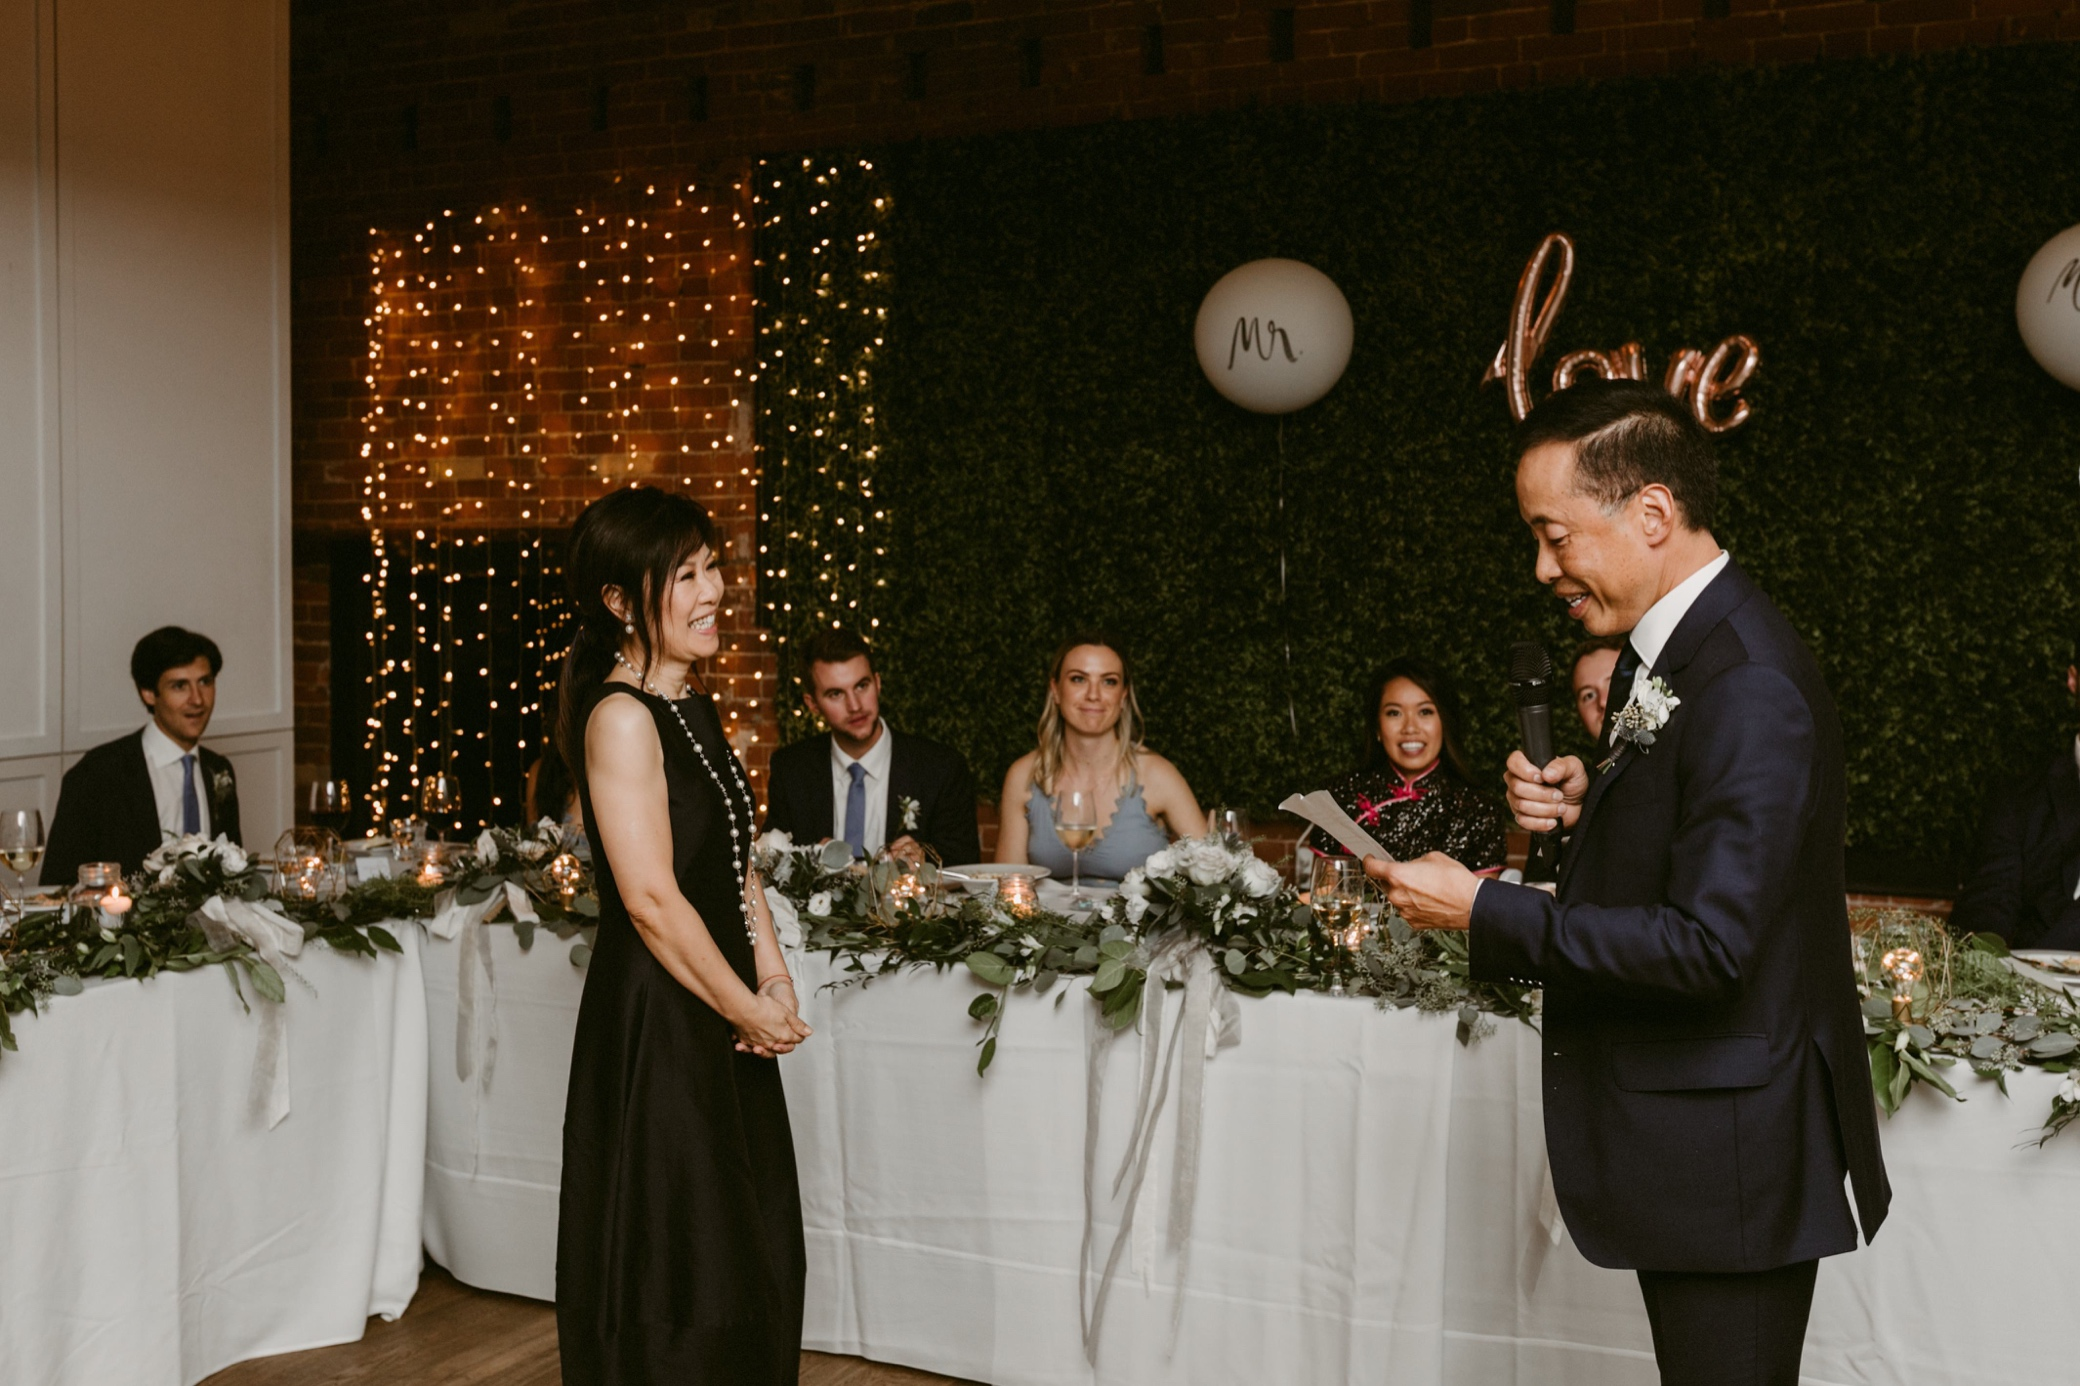 118_The Broadview Hotel Wedding (742 of 913).jpg